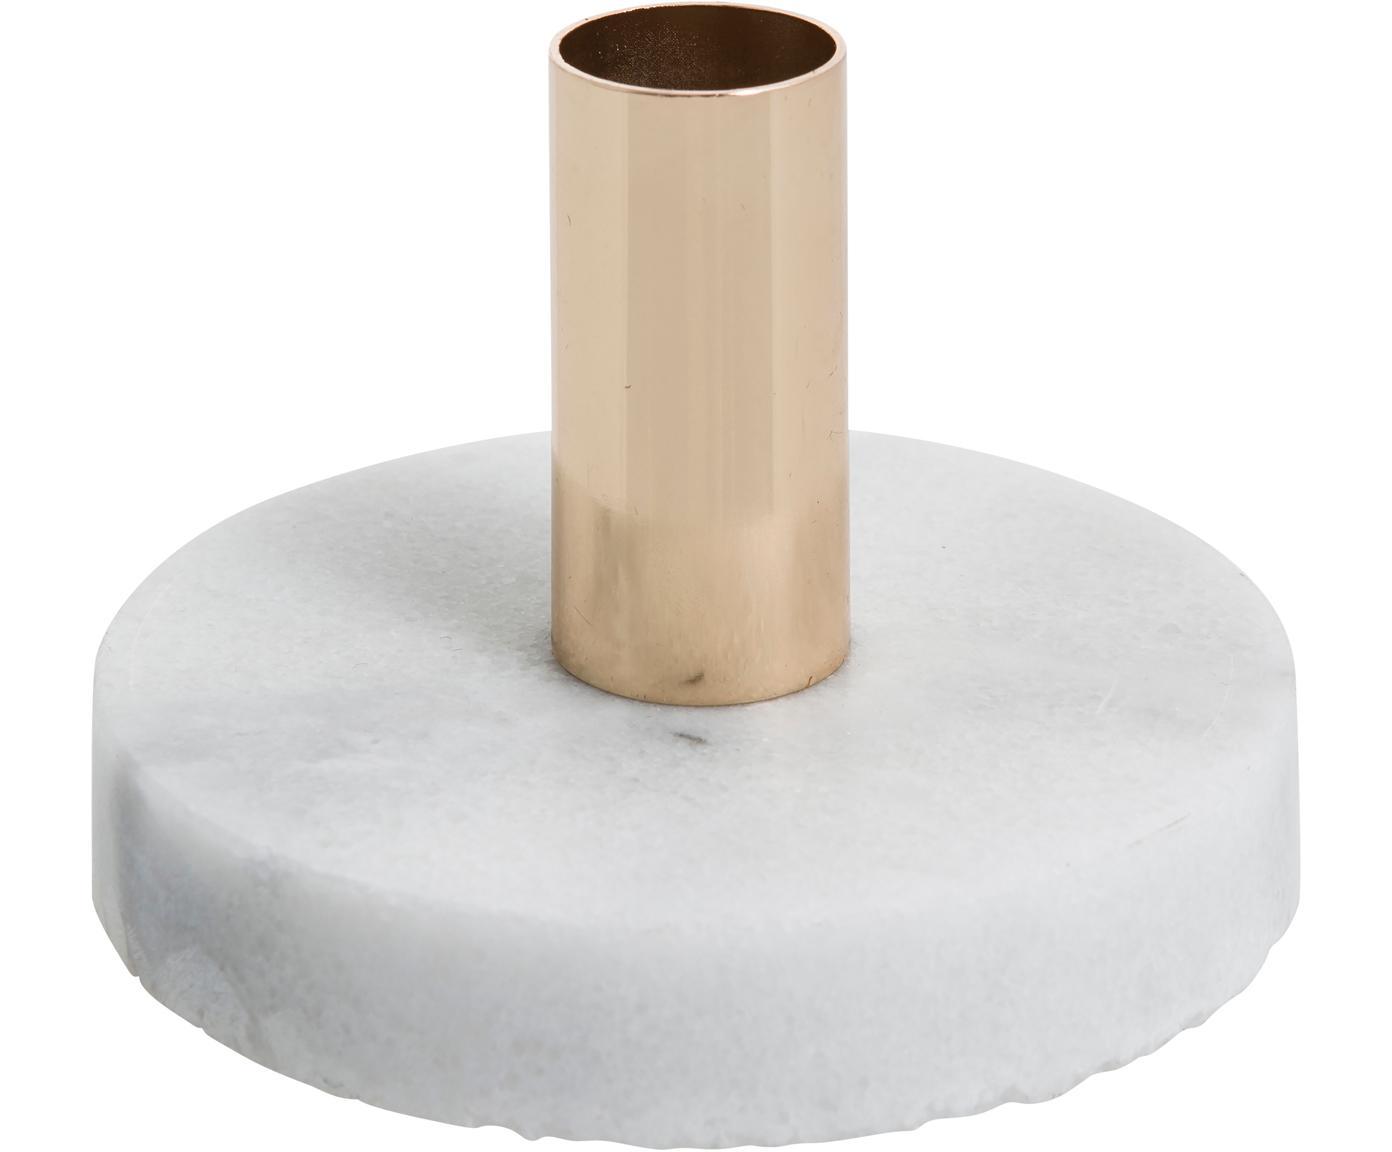 Marmor-Kerzenhalter Cole, Marmor, Metall, Weiß, Goldfarben, Ø 10 x H 7 cm